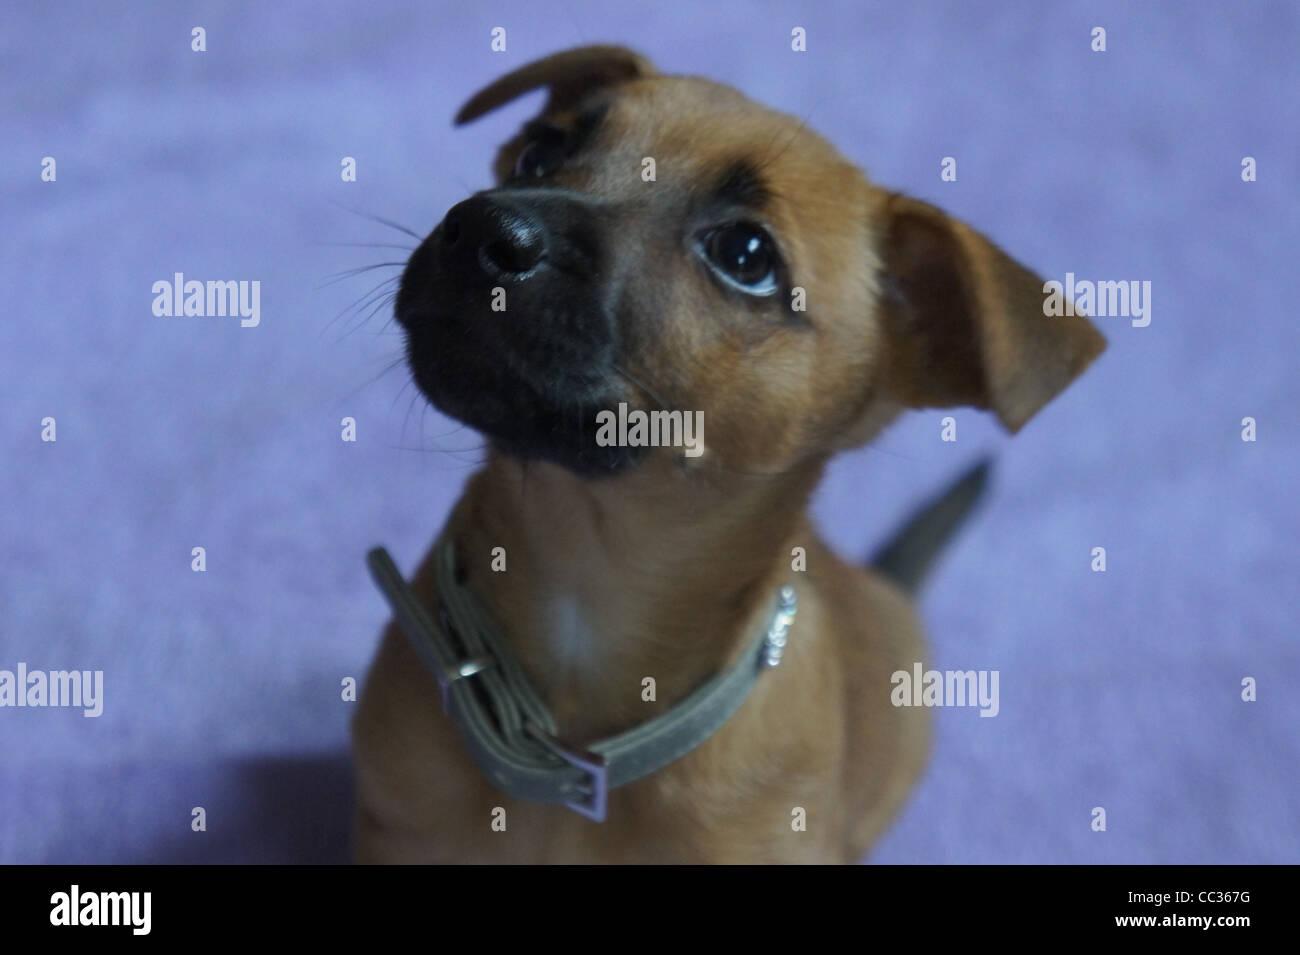 SONY DSC, Puppy in training - Stock Image